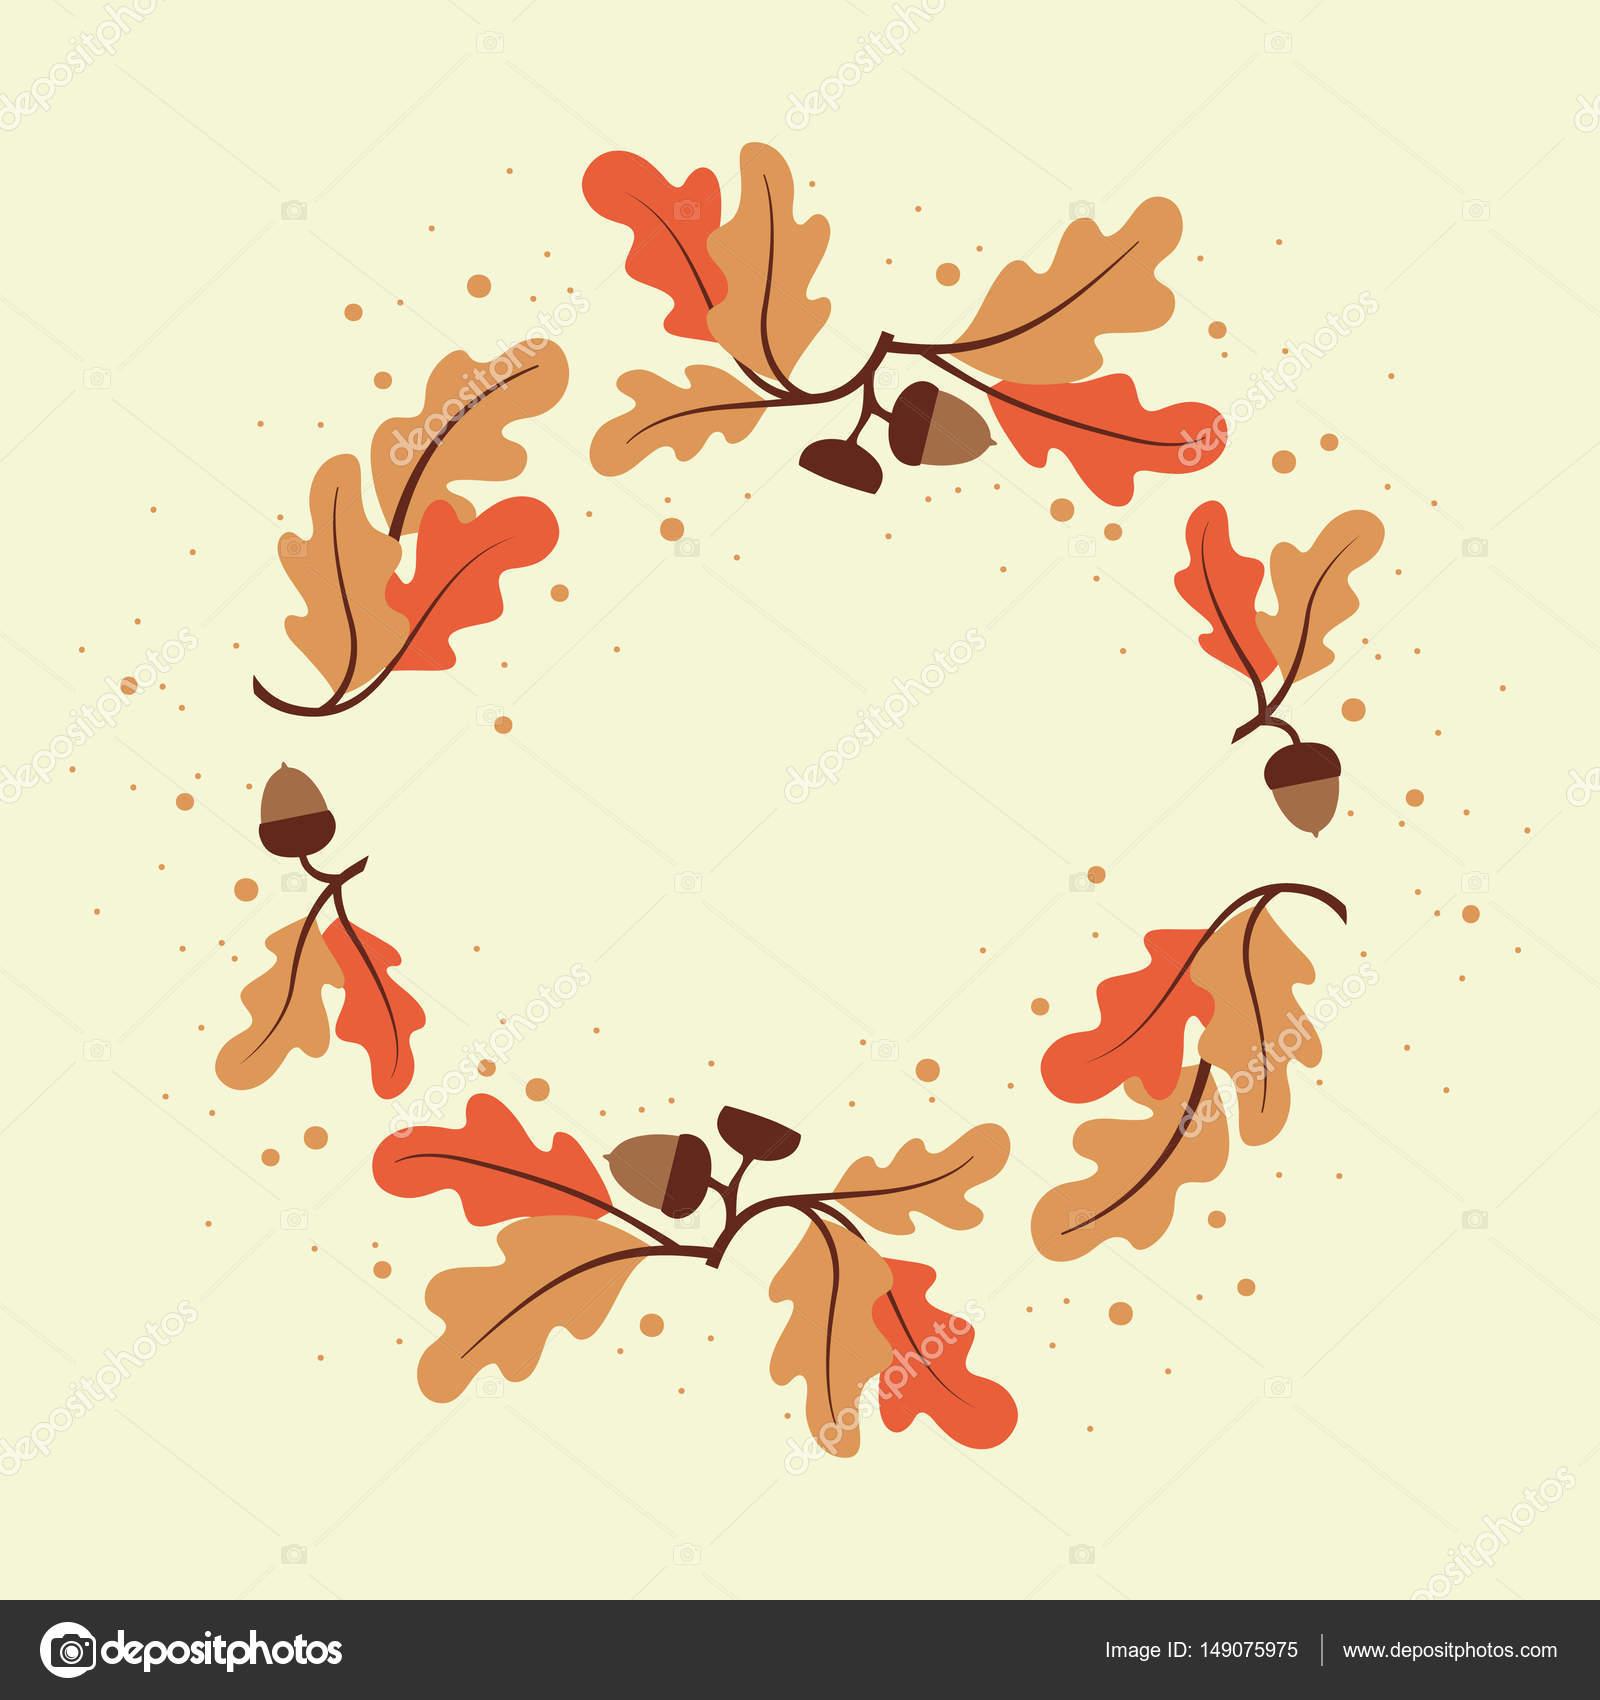 decorative wreath of oak leaves and acorns circular vector ornament